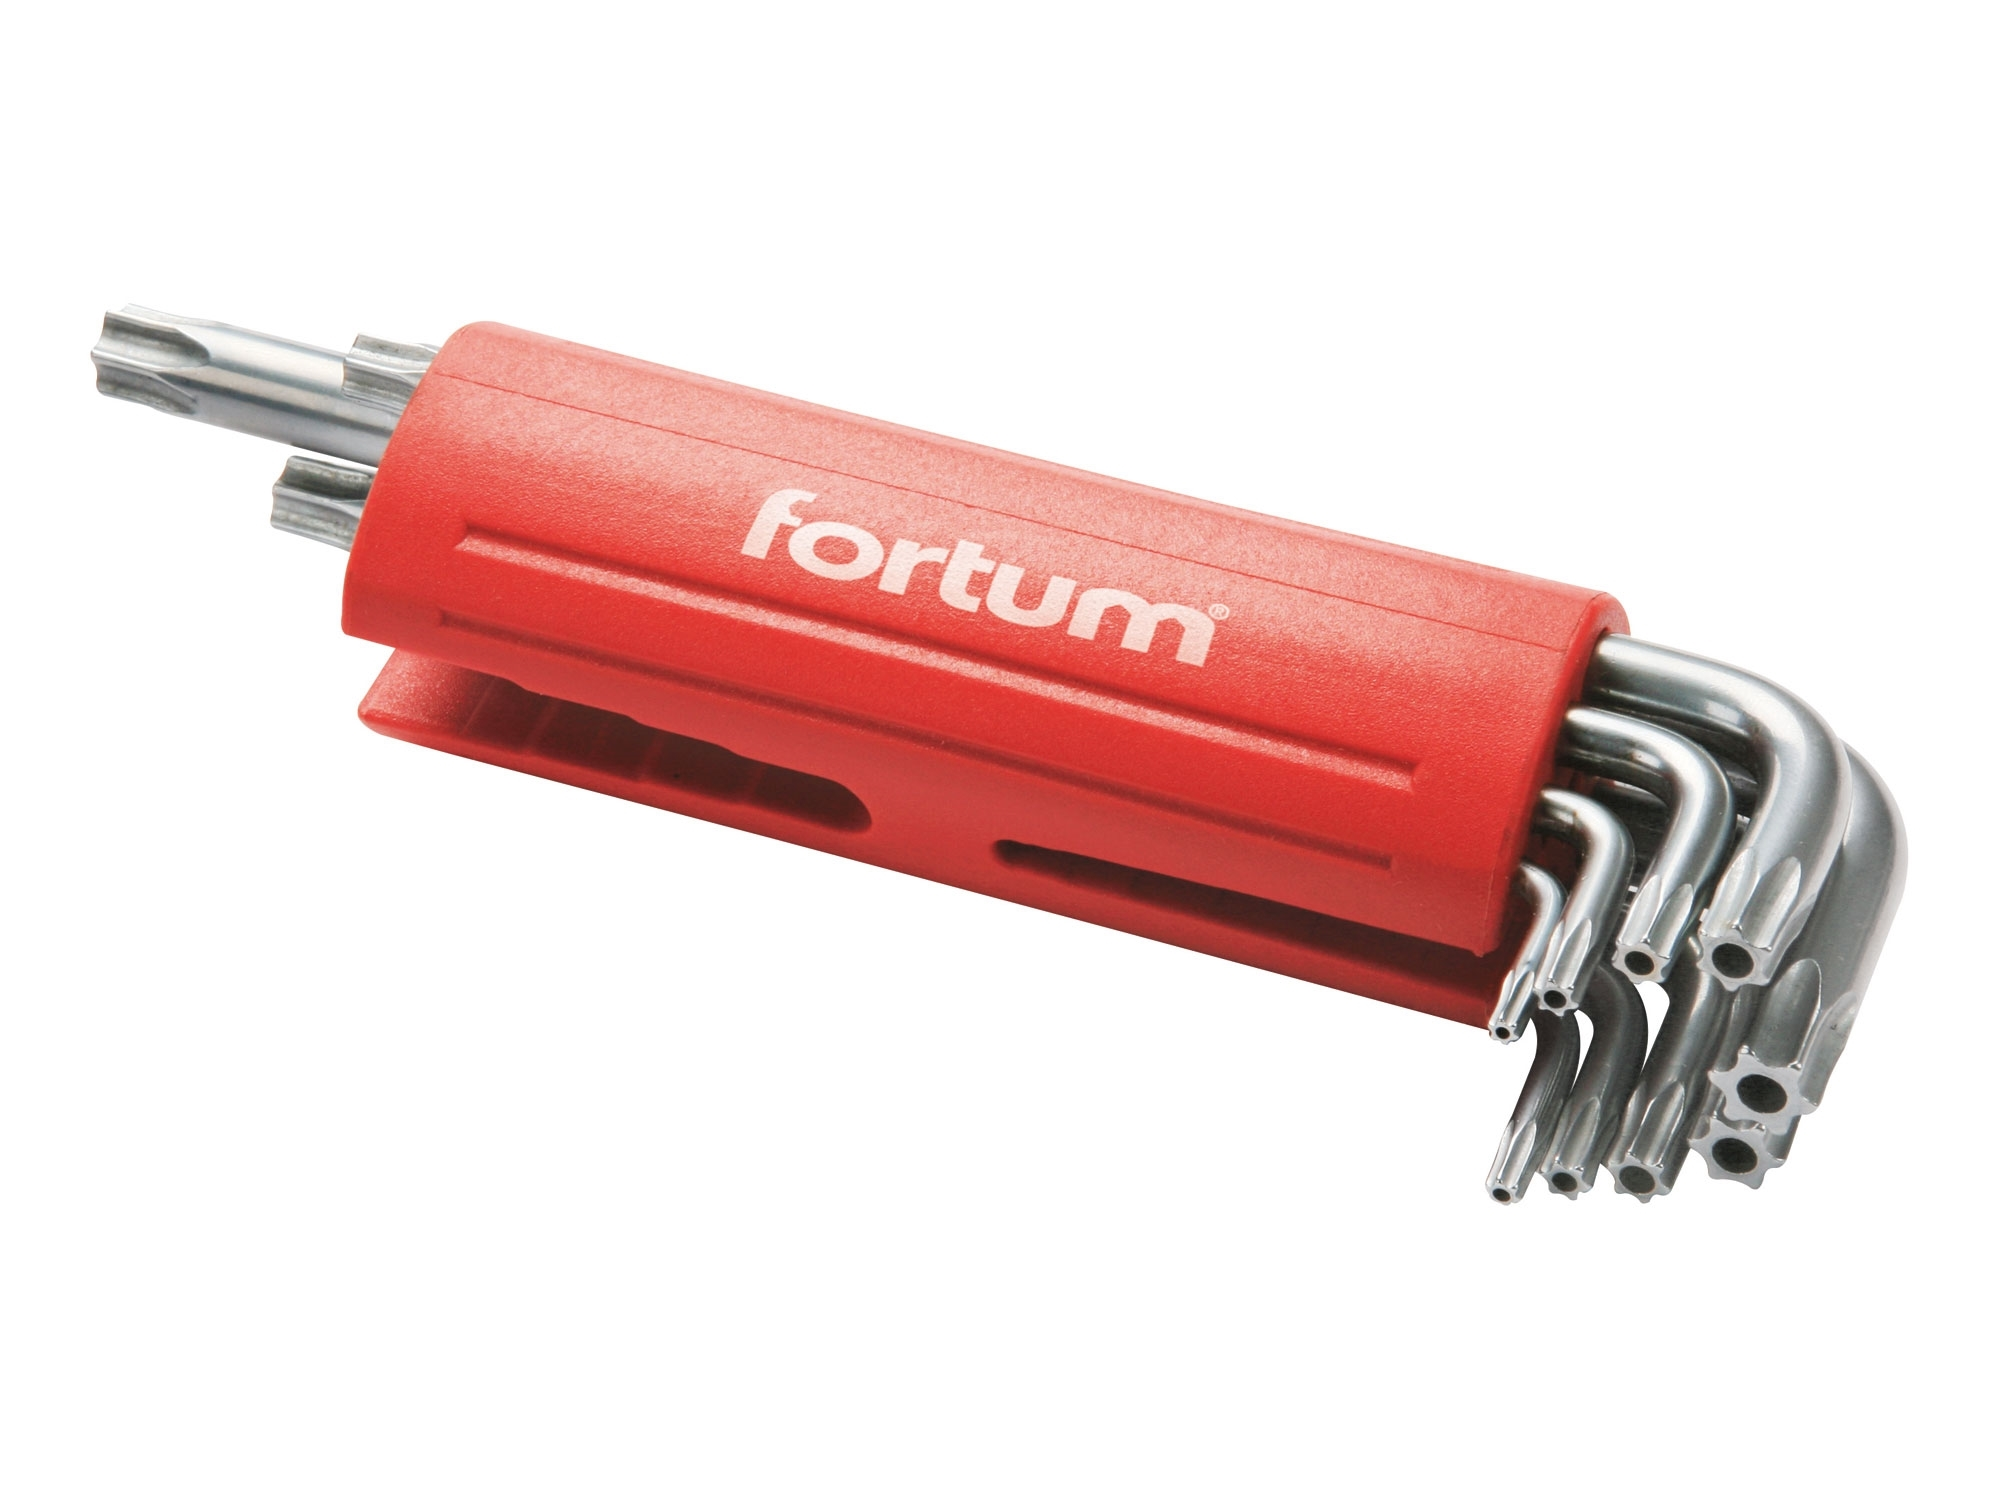 L-klíče TORX vrtané, sada 9ks, 10-50